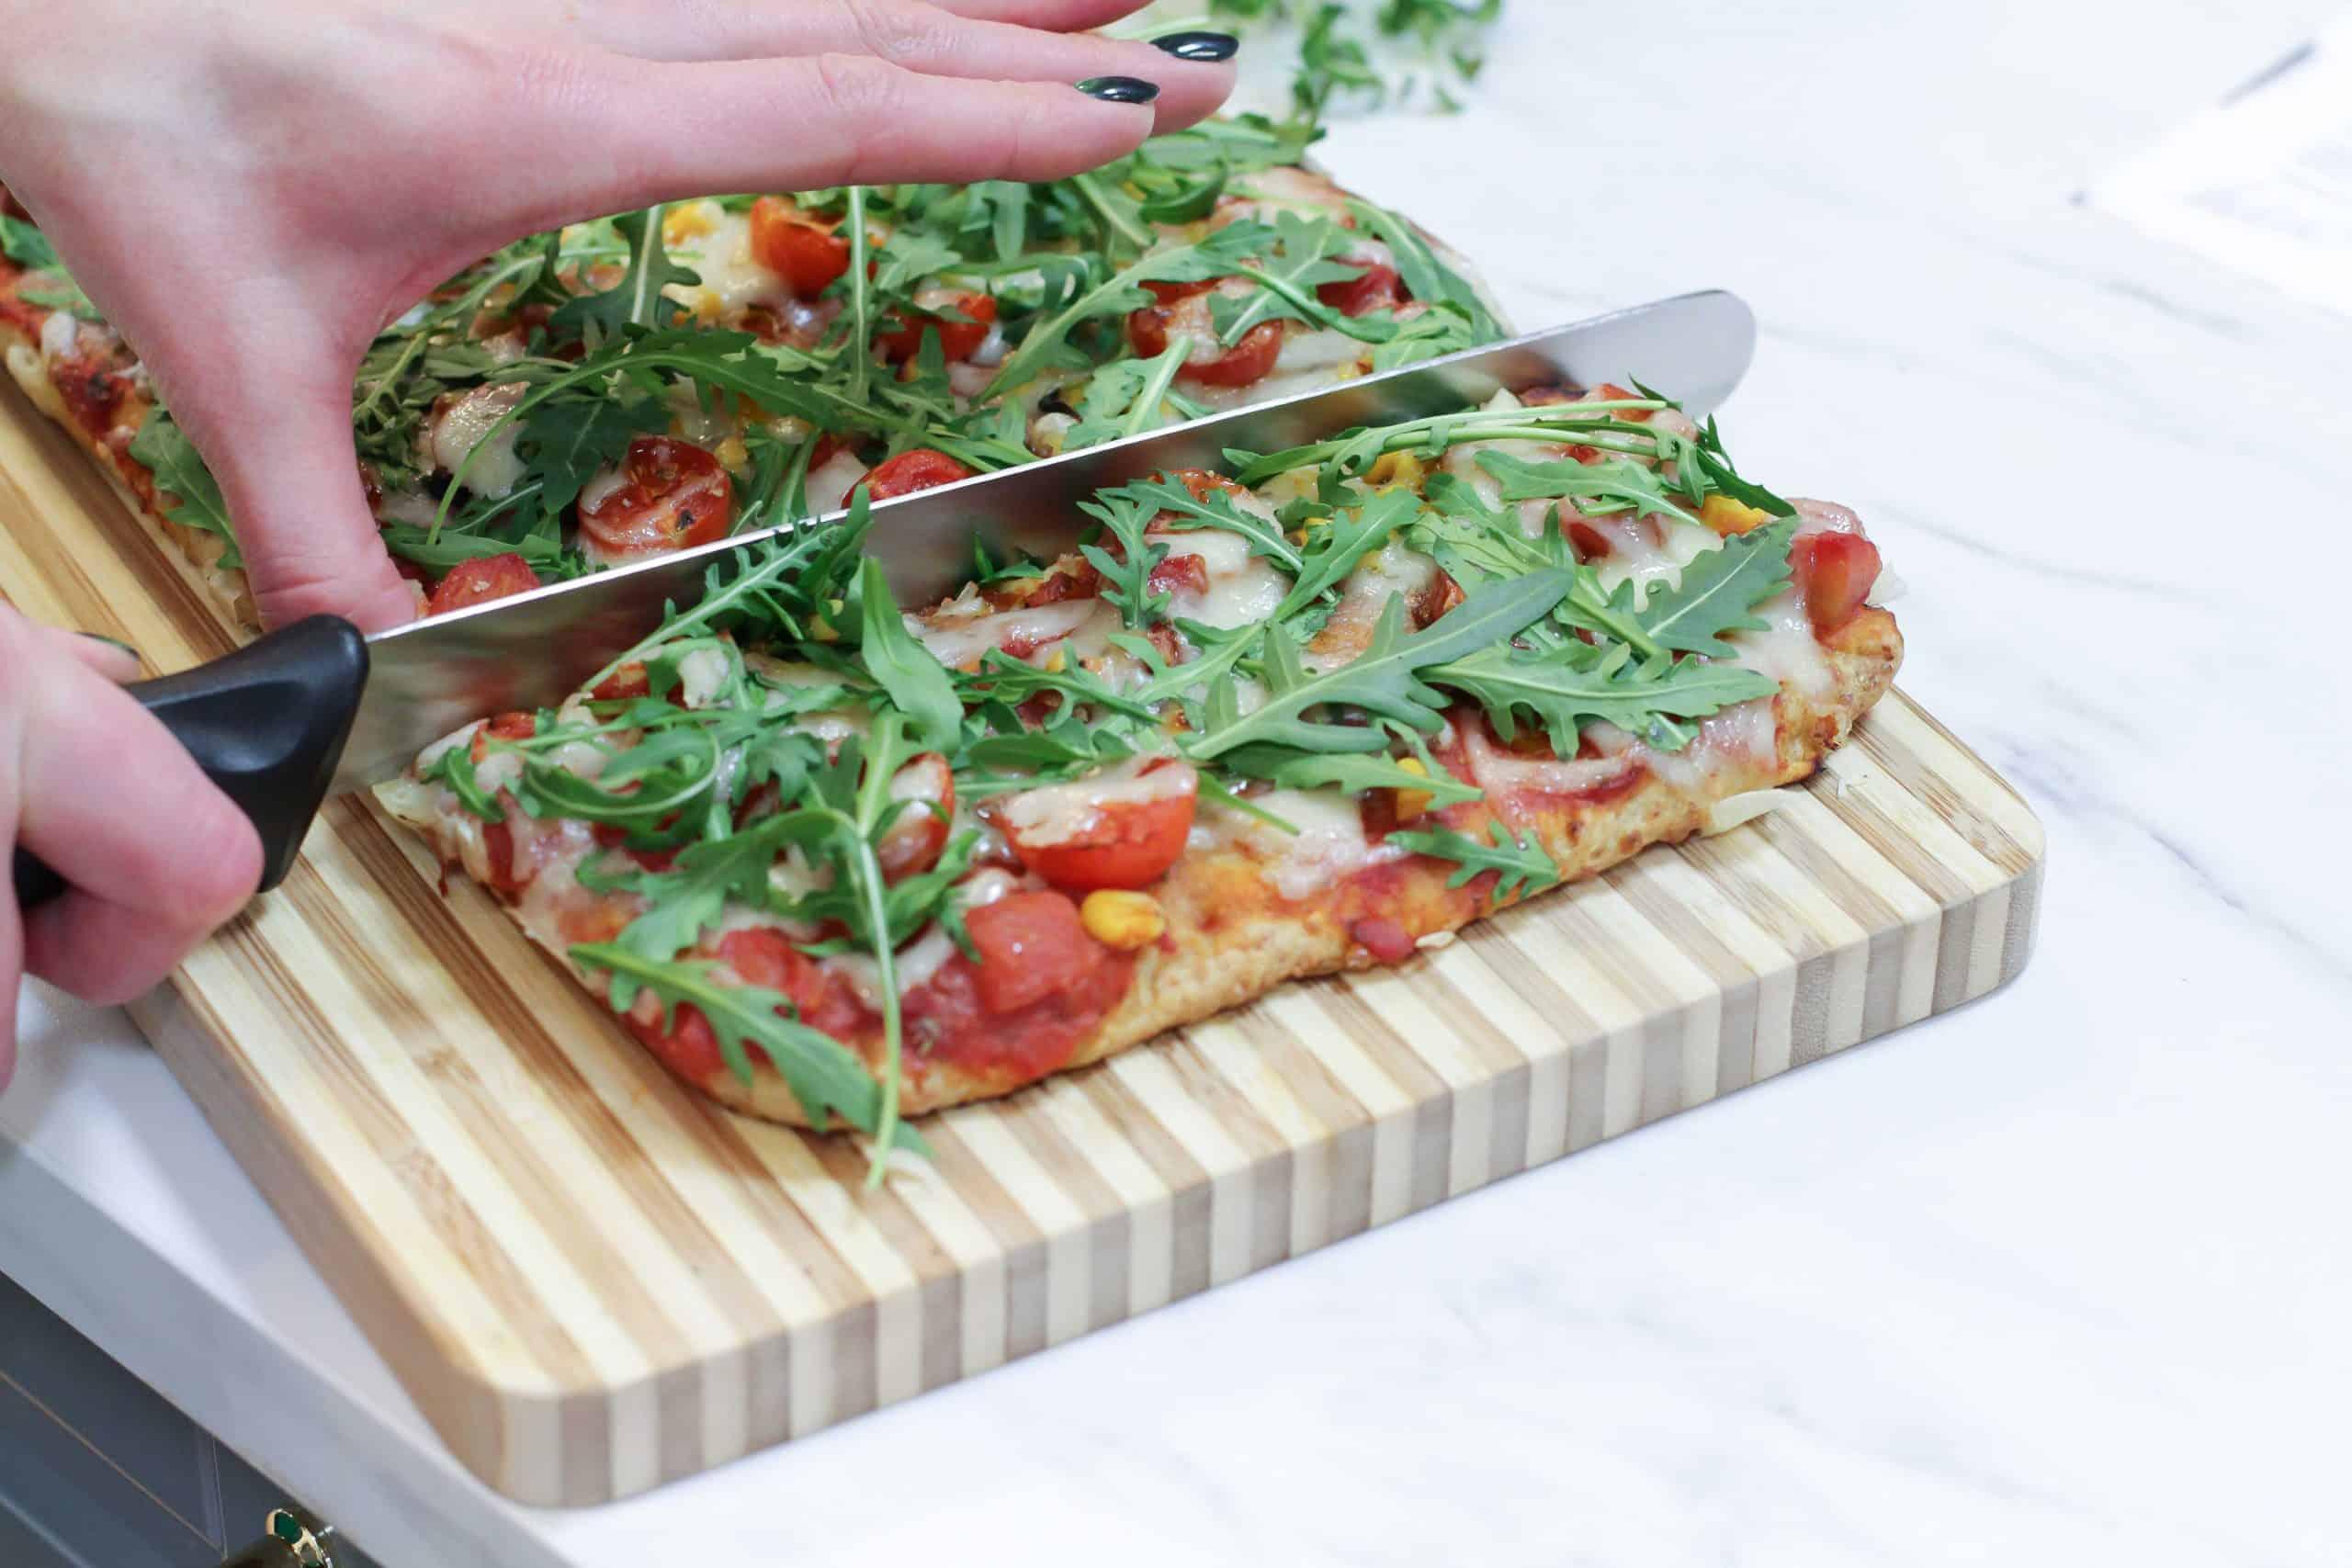 pica receptas sveika mityba